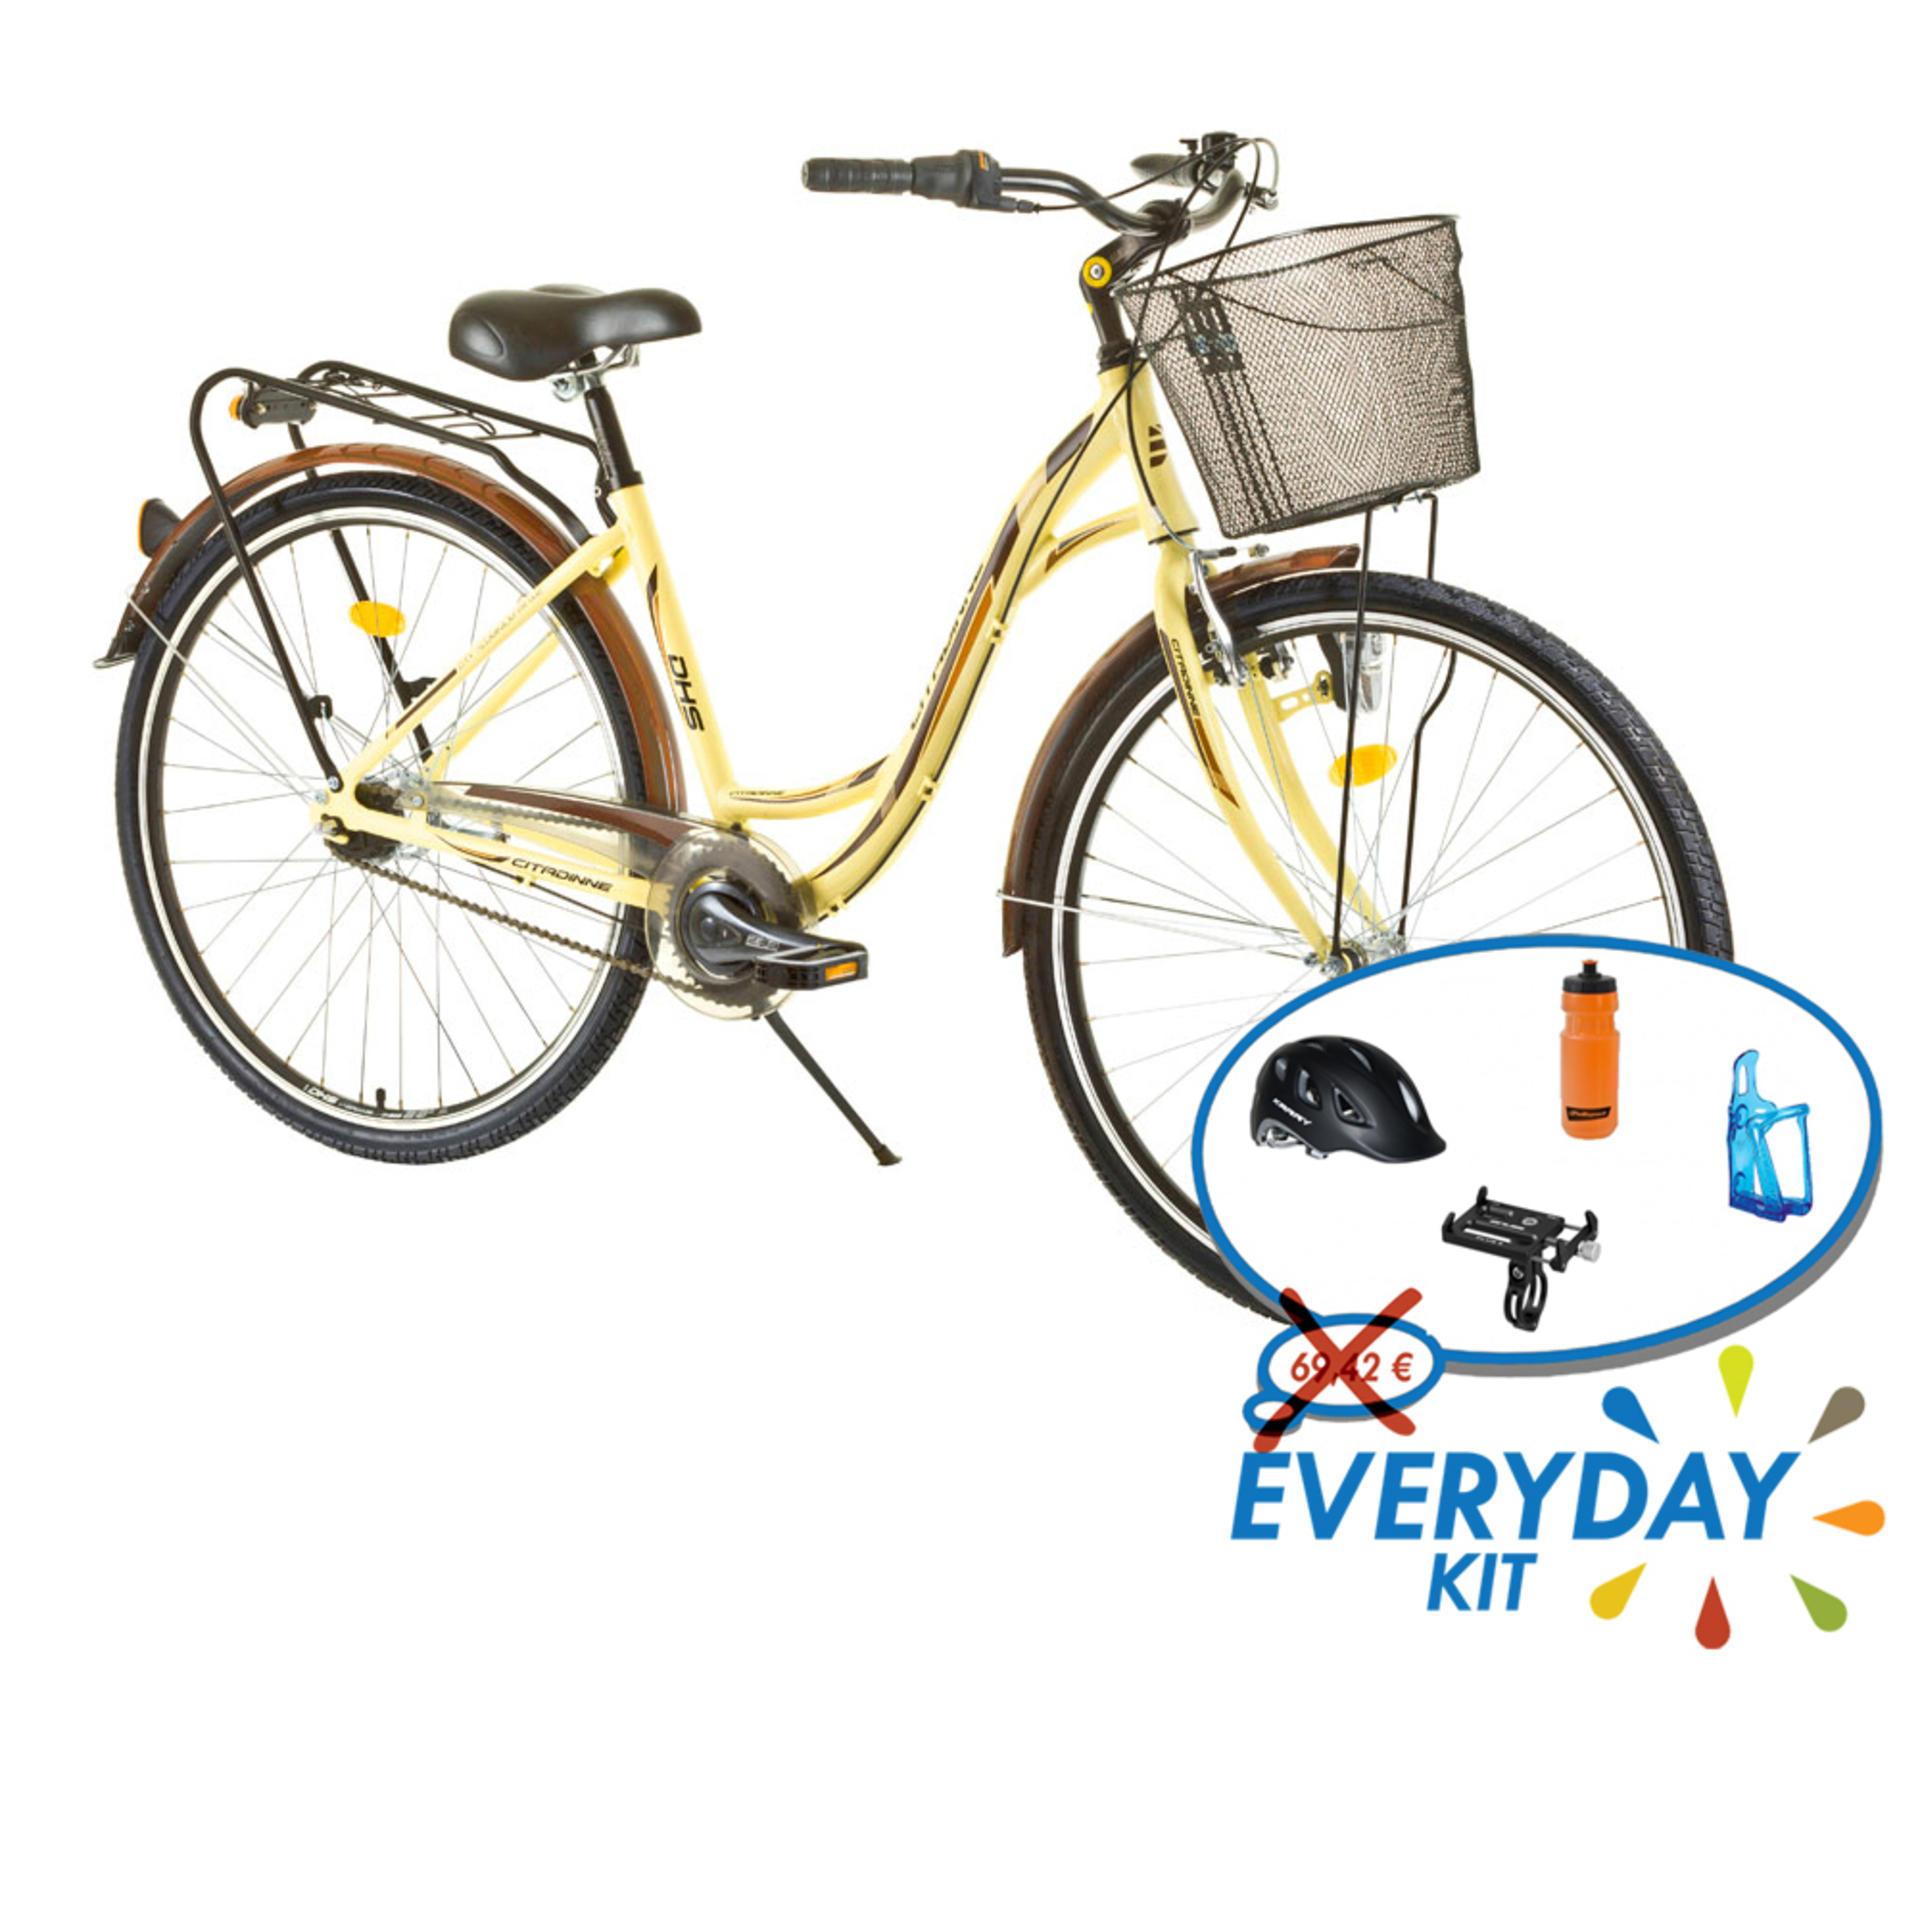 Bicicletta donna da città DHS Citadinne DHS 2838 Yellow 505mm